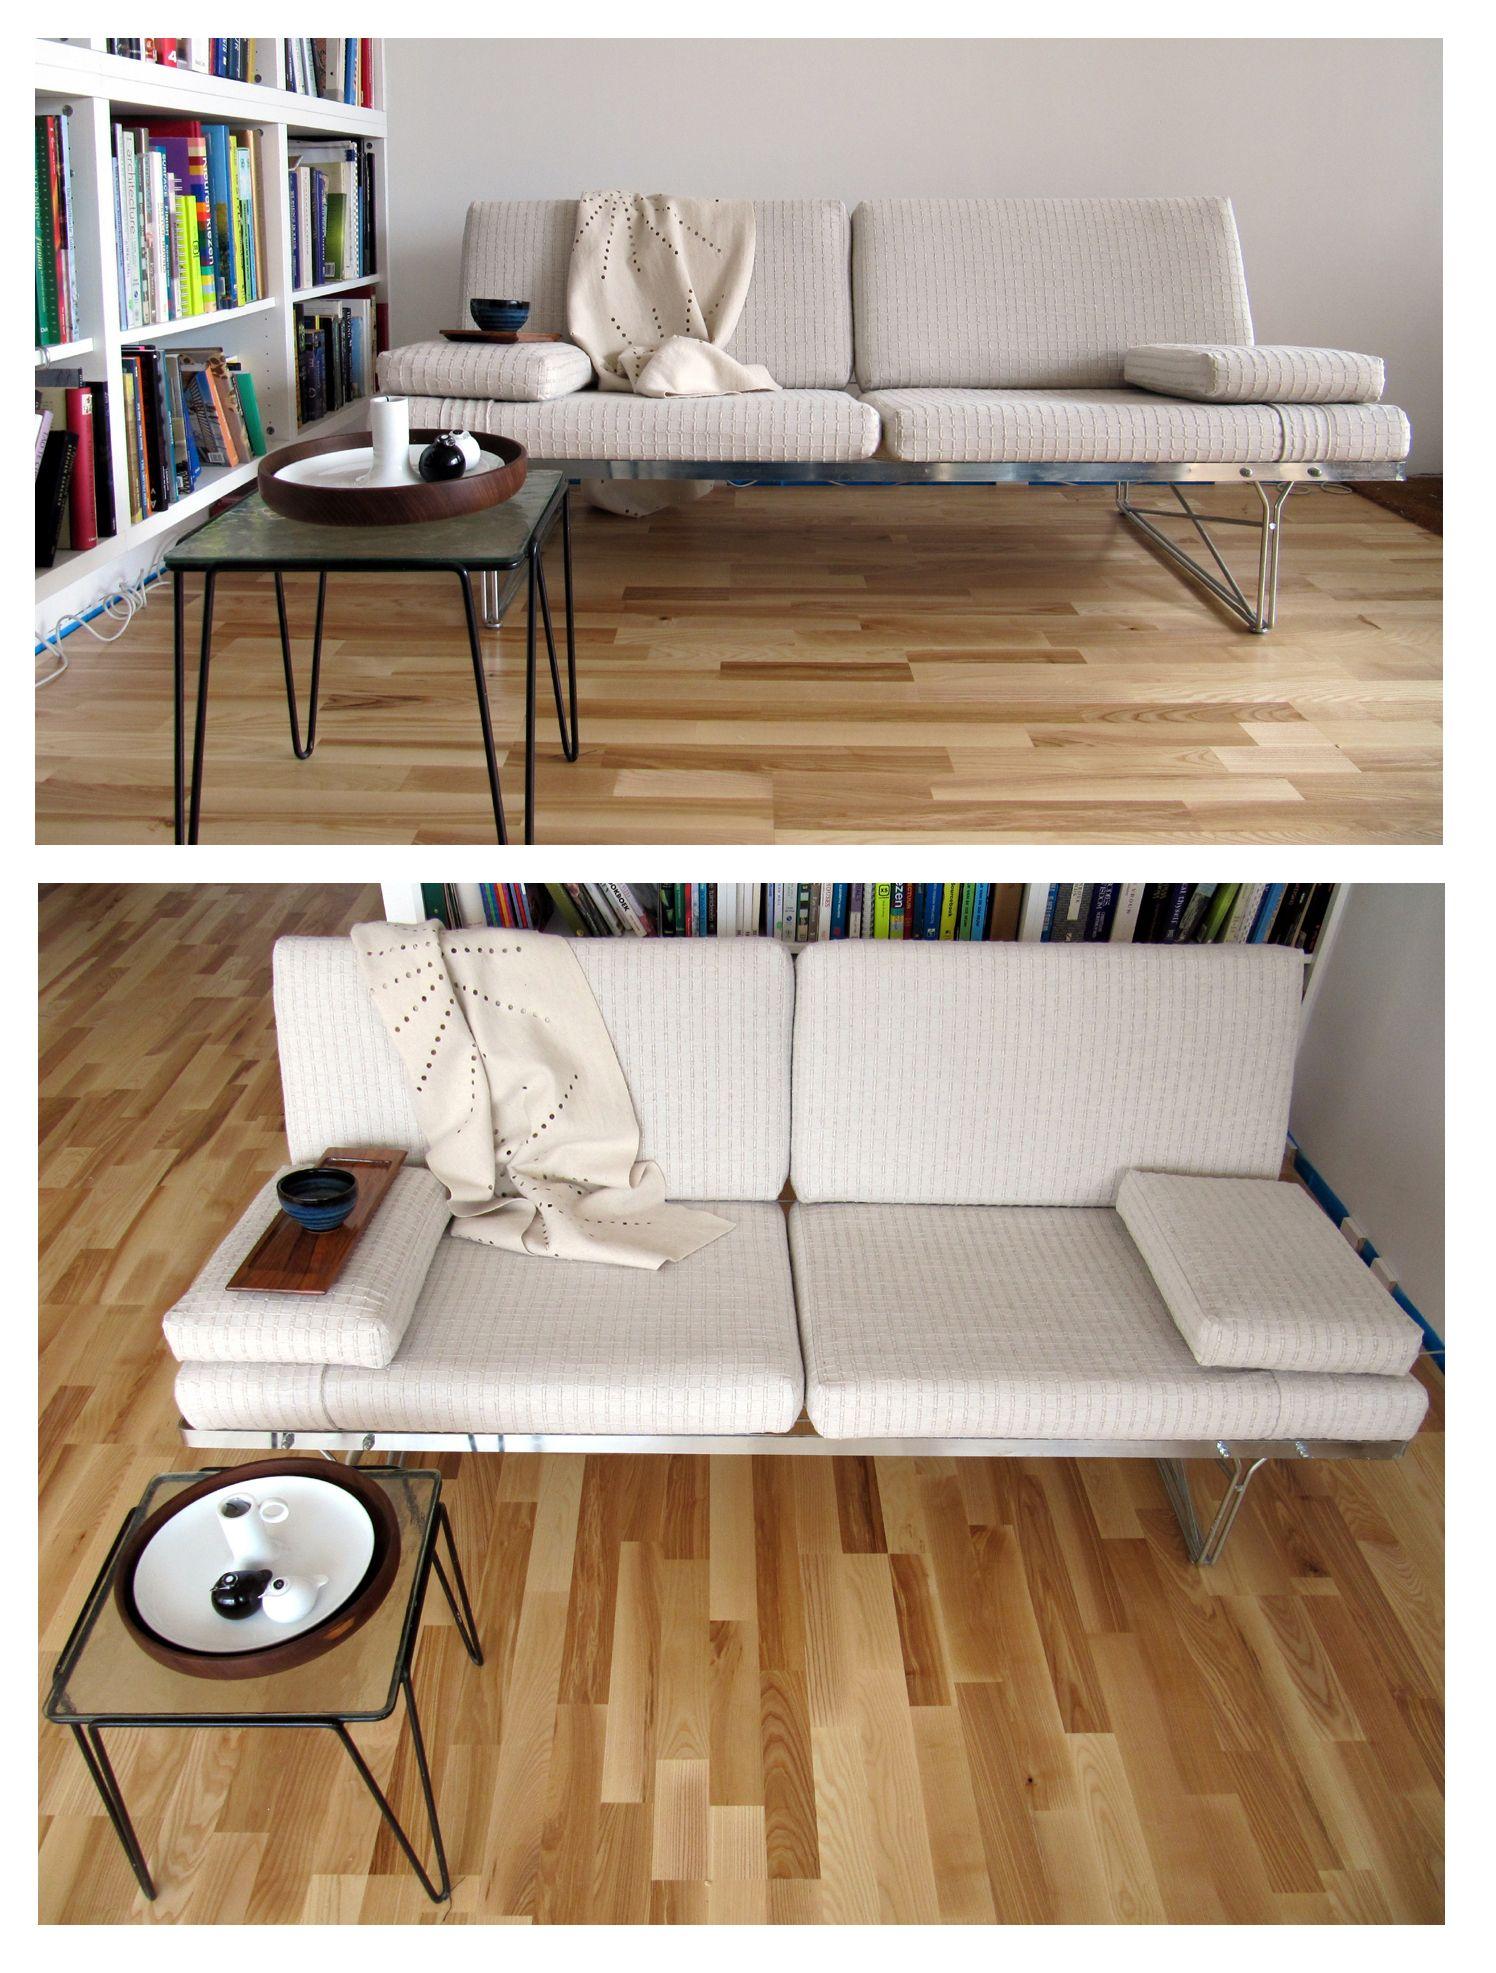 sofa 1 meter breit vidaxl schlafsofa sofabett schlafcouch bettsofa sofa couch kunstleder. Black Bedroom Furniture Sets. Home Design Ideas